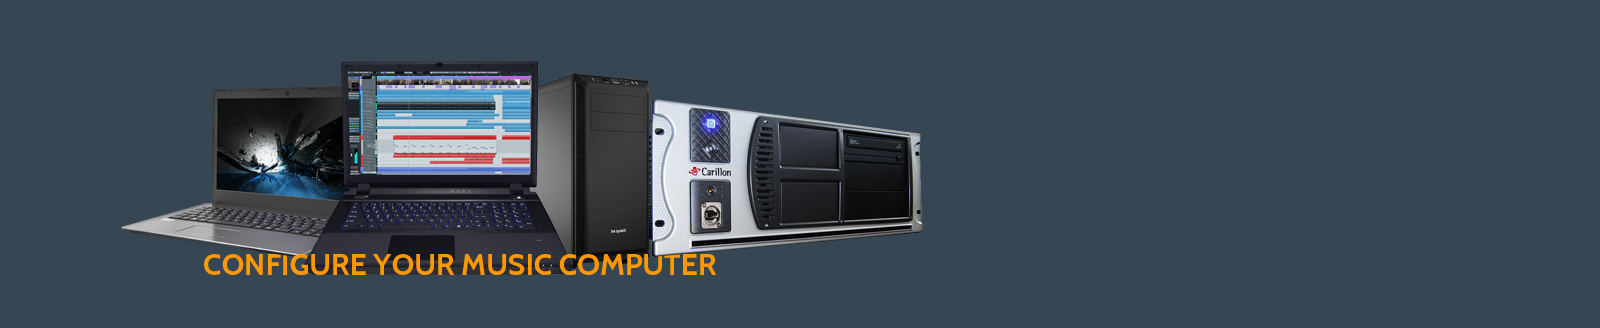 Configure your Carillon audio computer,  laptop, tower, rack